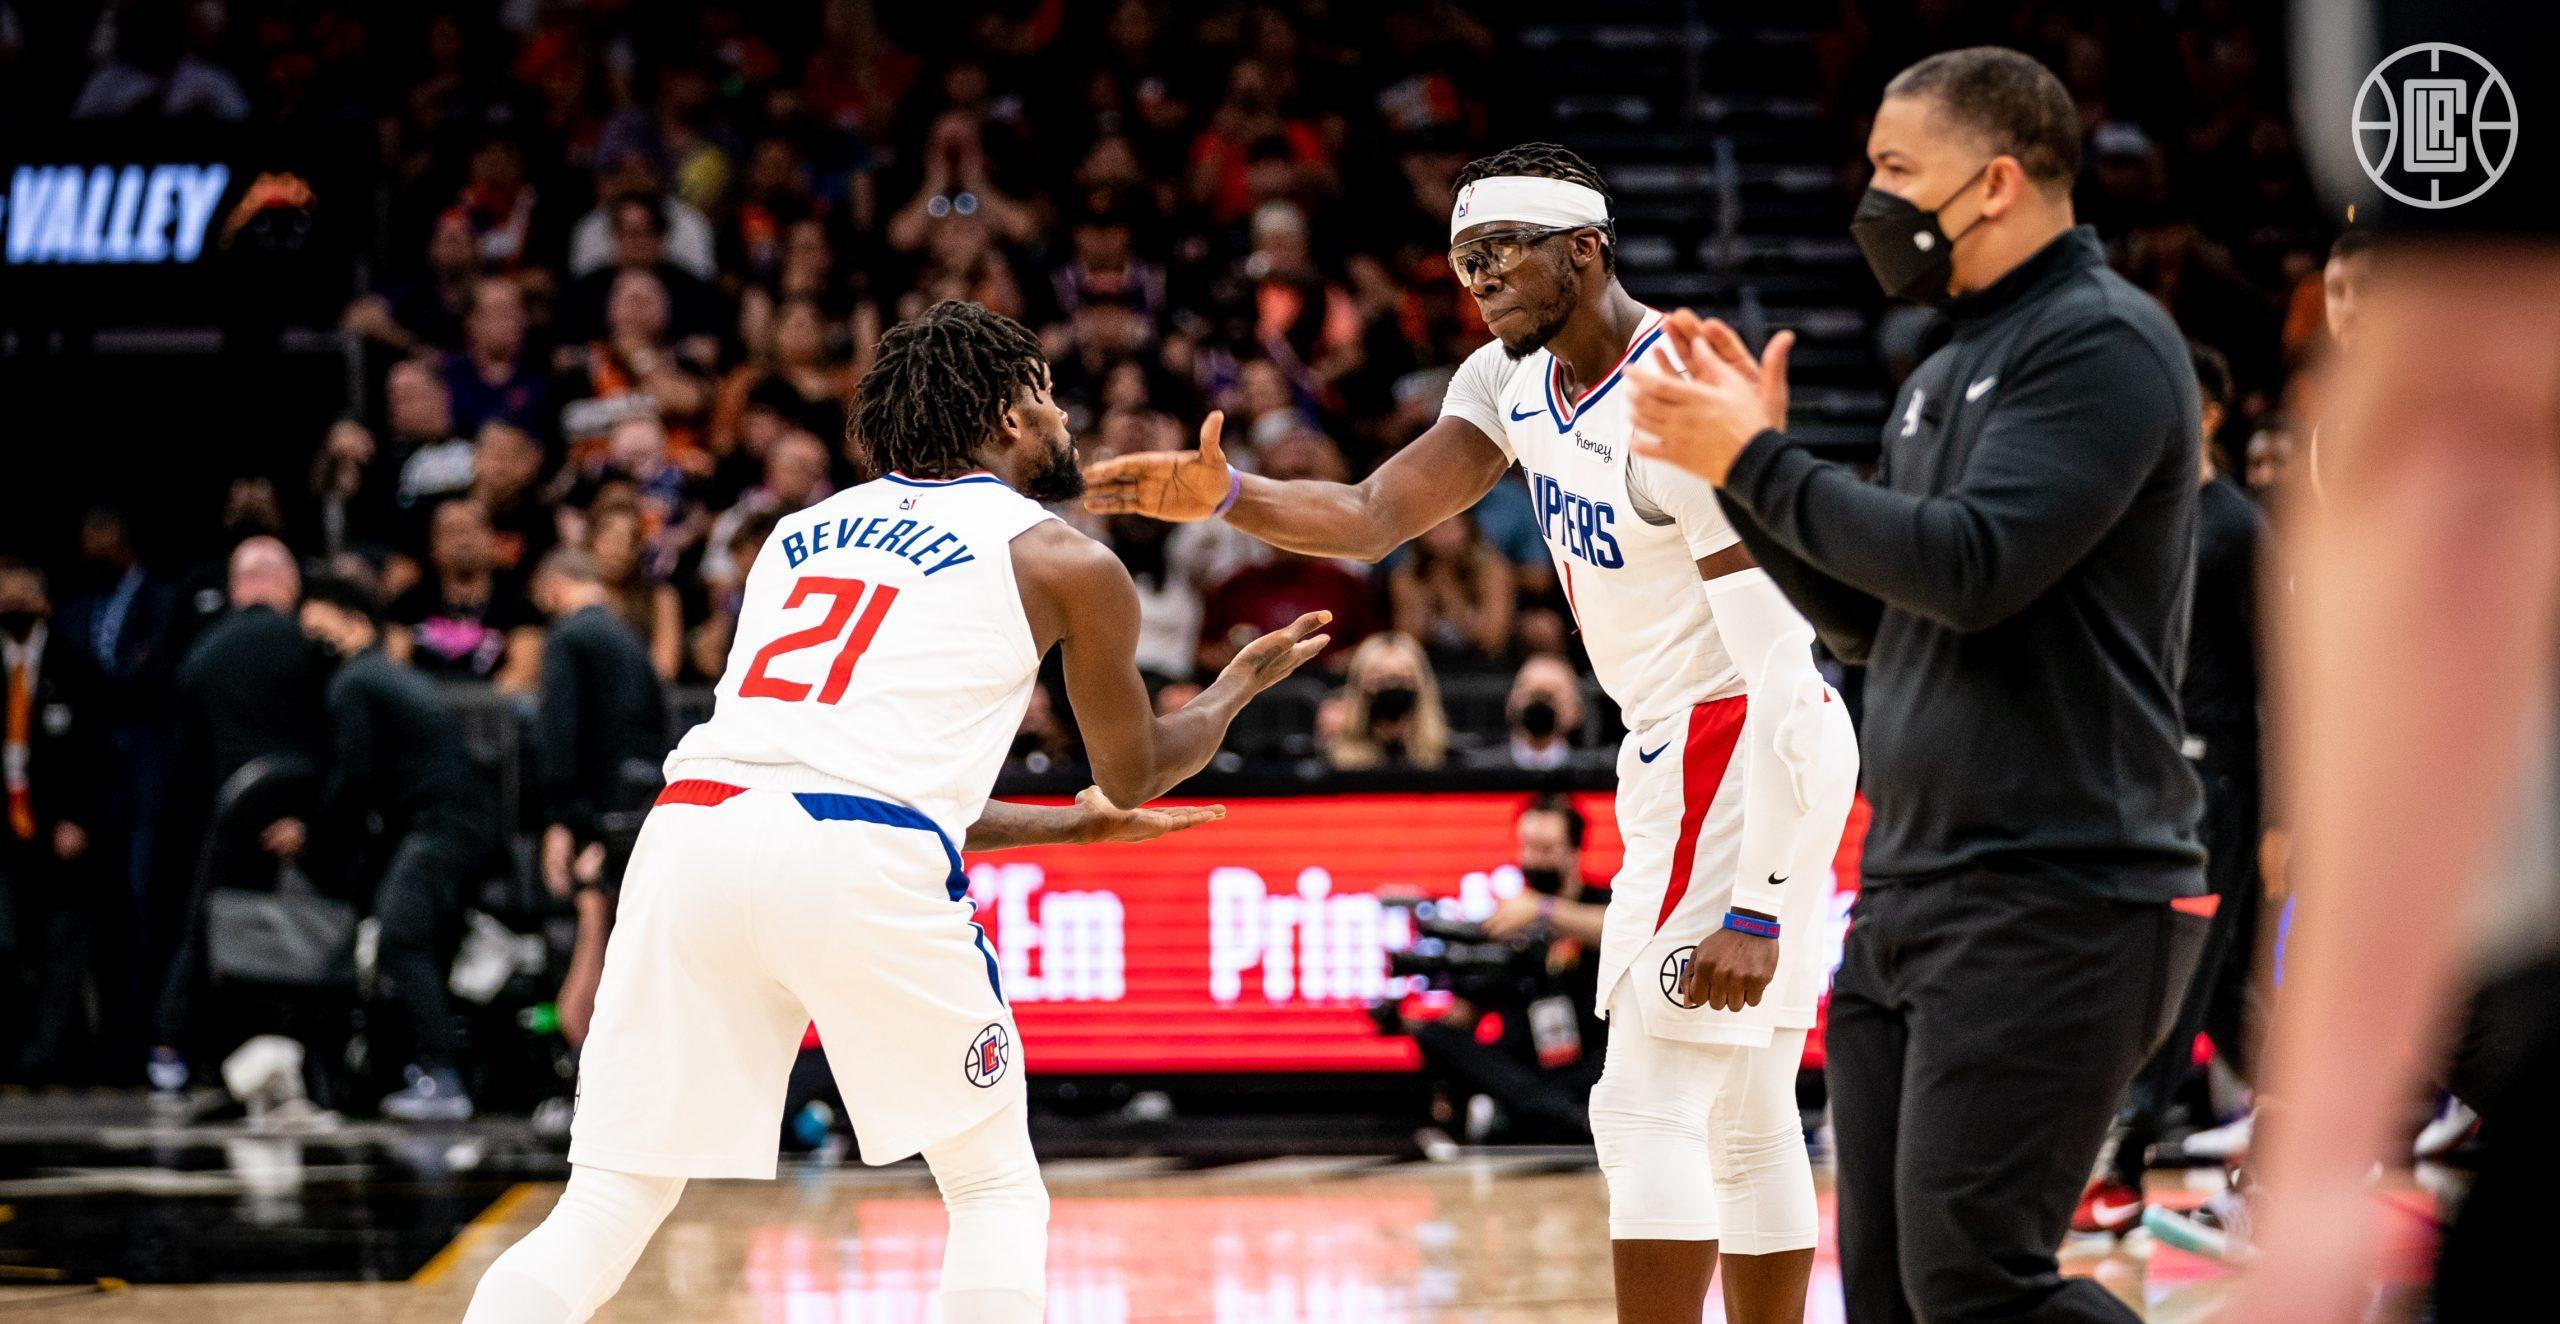 Clippers 2021 Exit Interview: Reggie Jackson